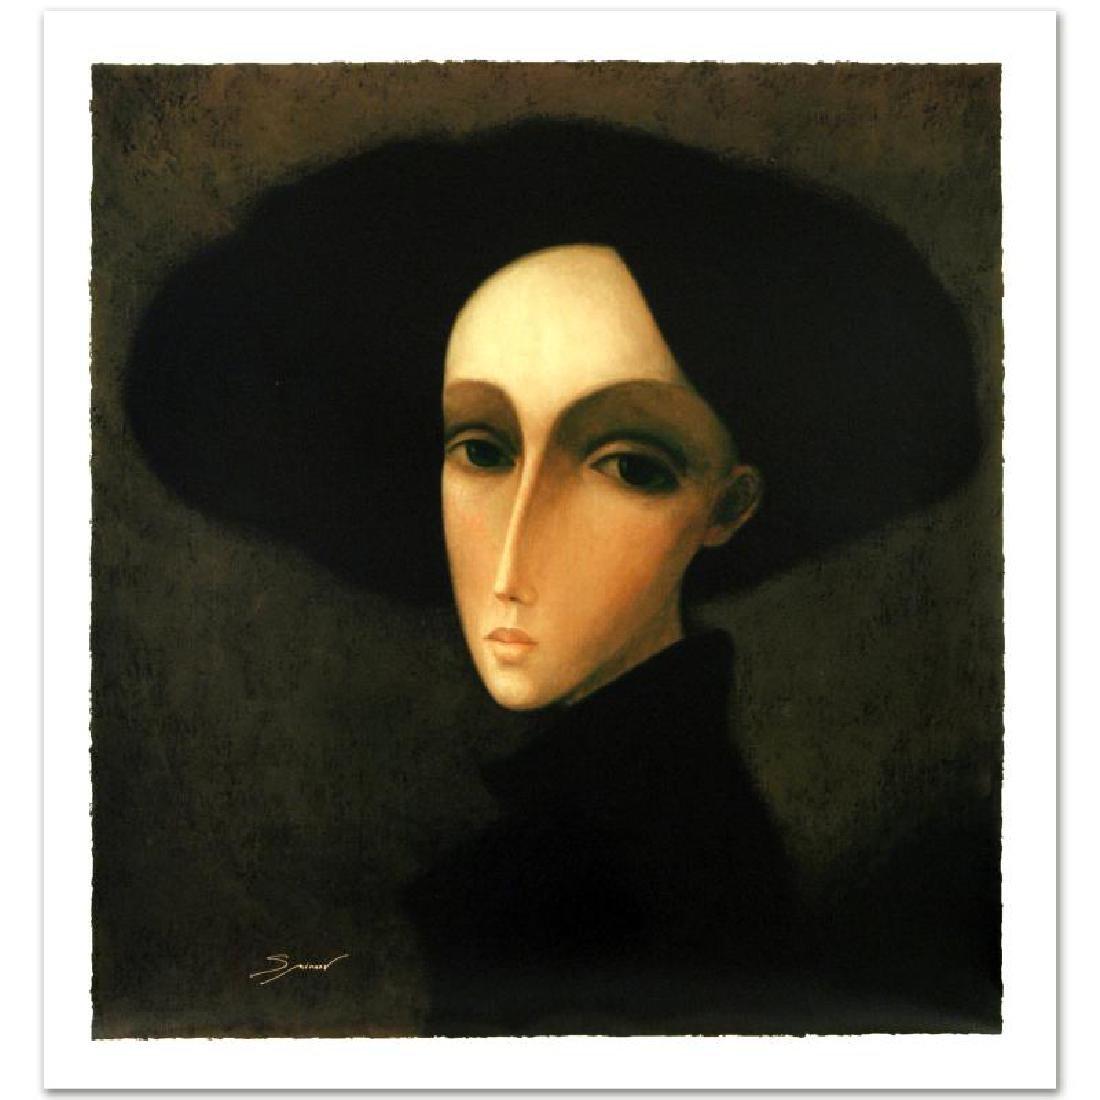 Legendary Russian Artist Sergey Smirnov (1953-2006)